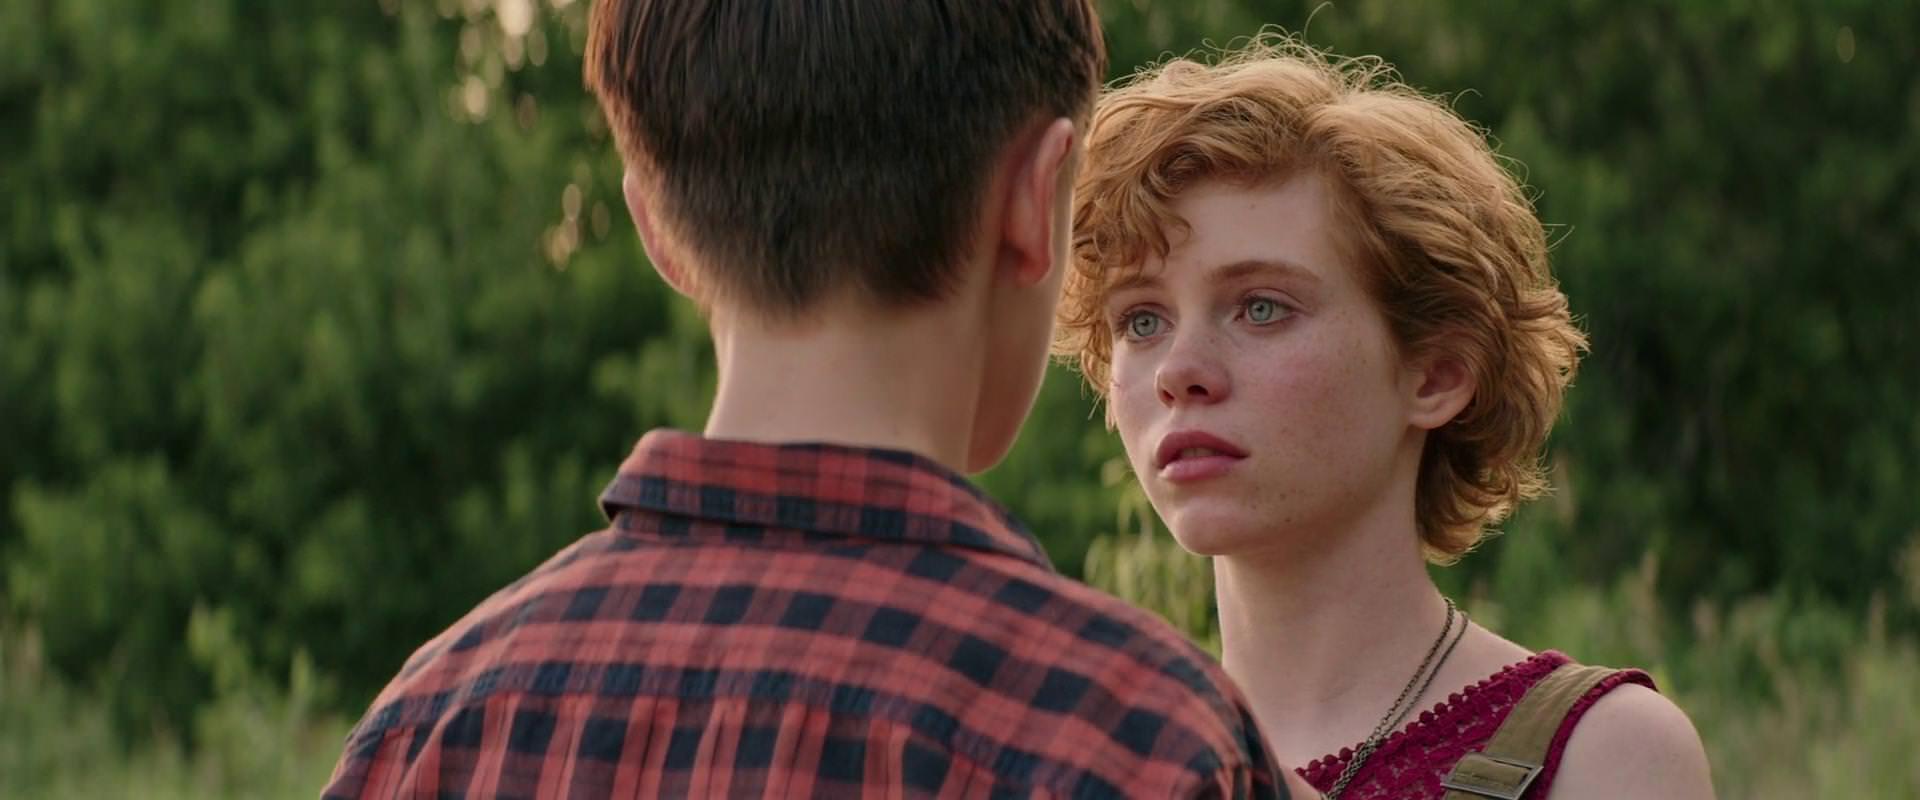 Warner Bros  is Now Hiring Crew for Upcoming Film 'Nancy Drew & the